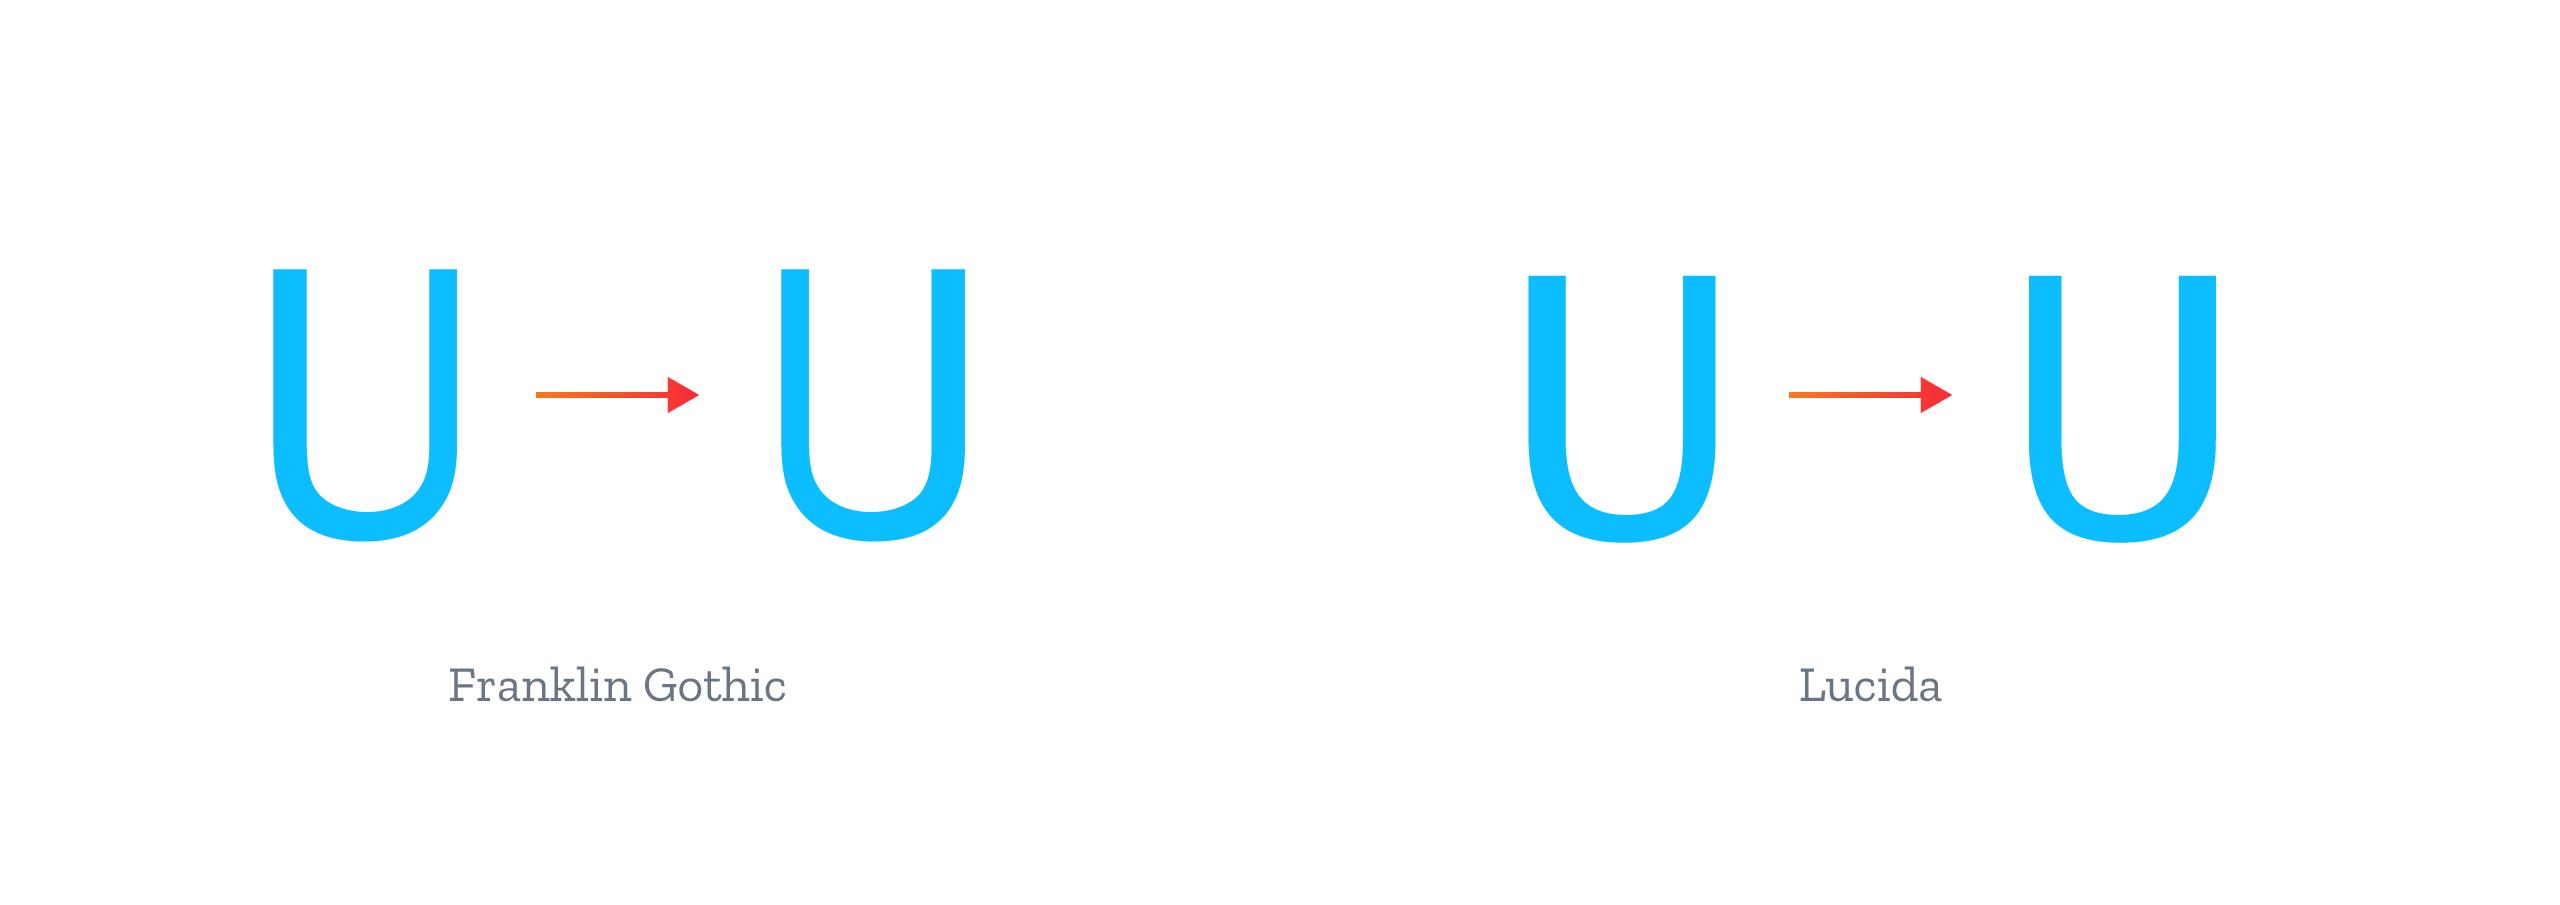 /U variation